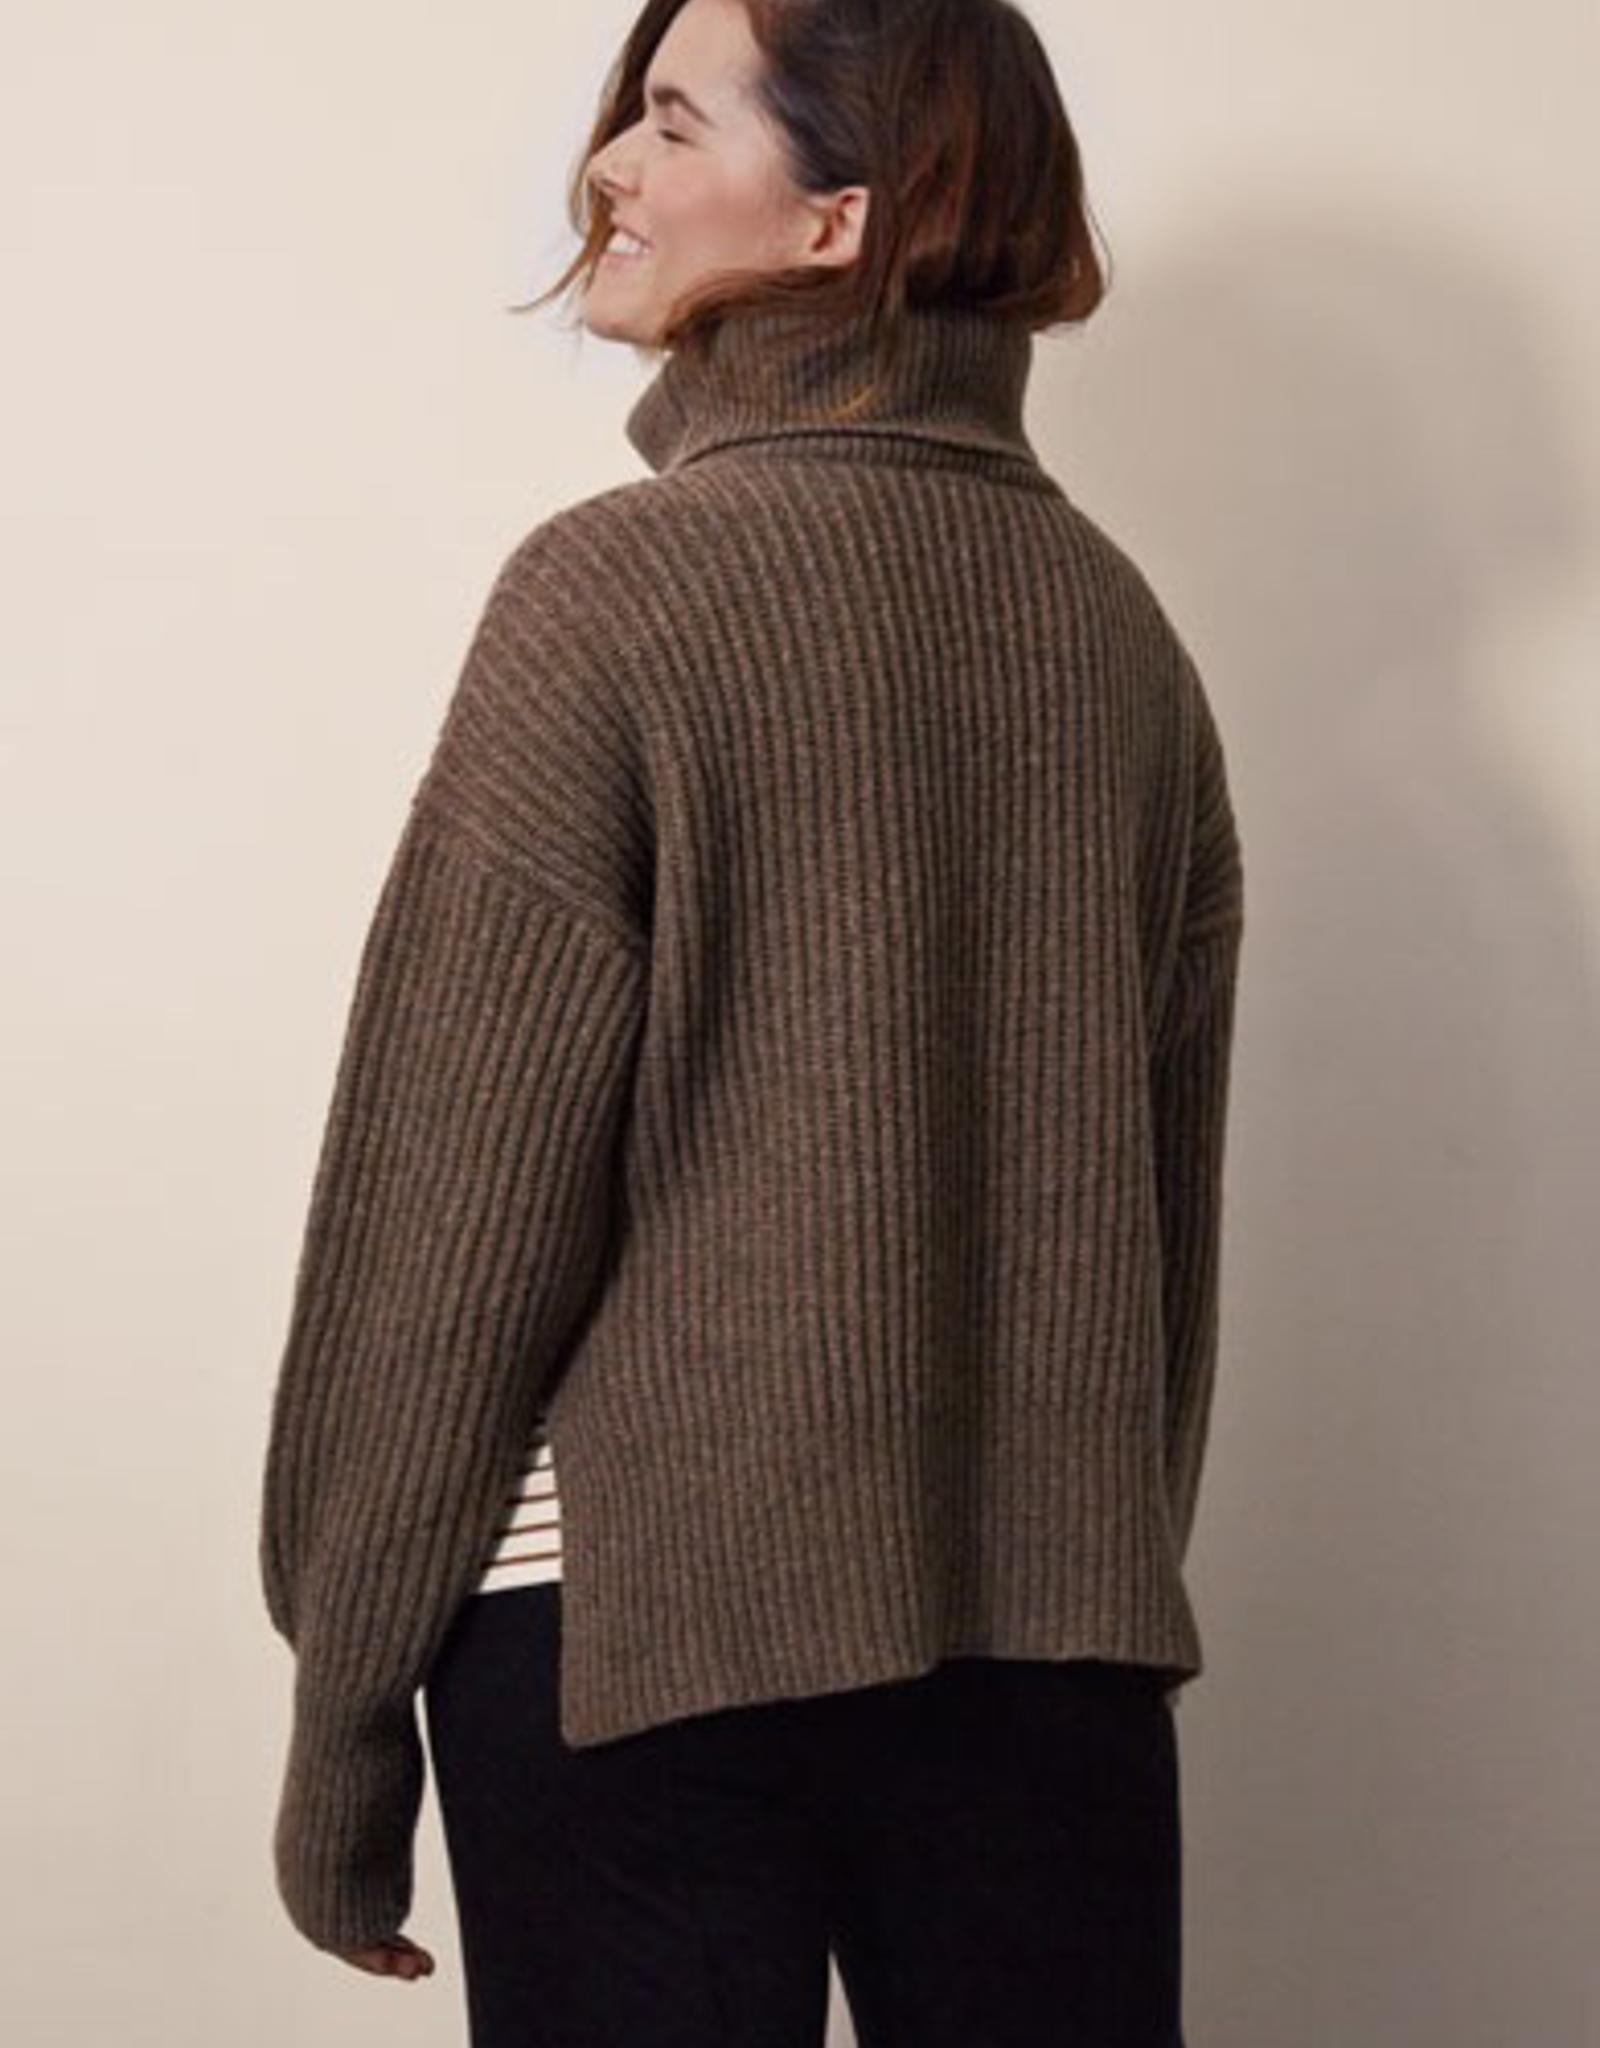 Boob Design Frida Maternity/Nursing Knit Sweater